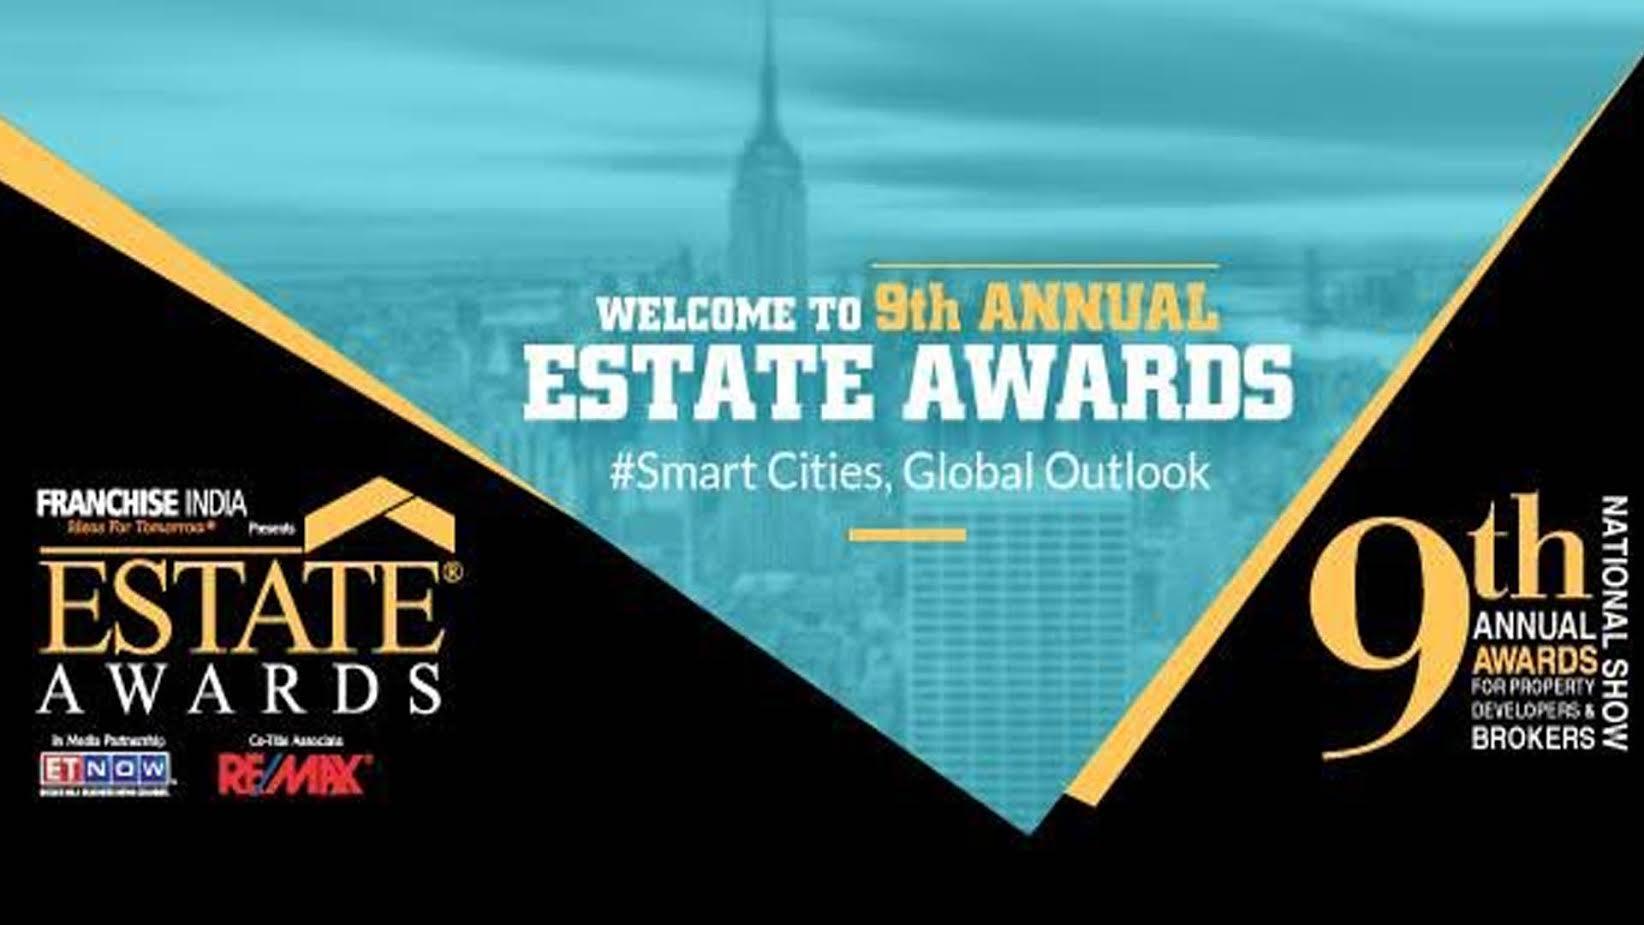 Estate Awards 2016